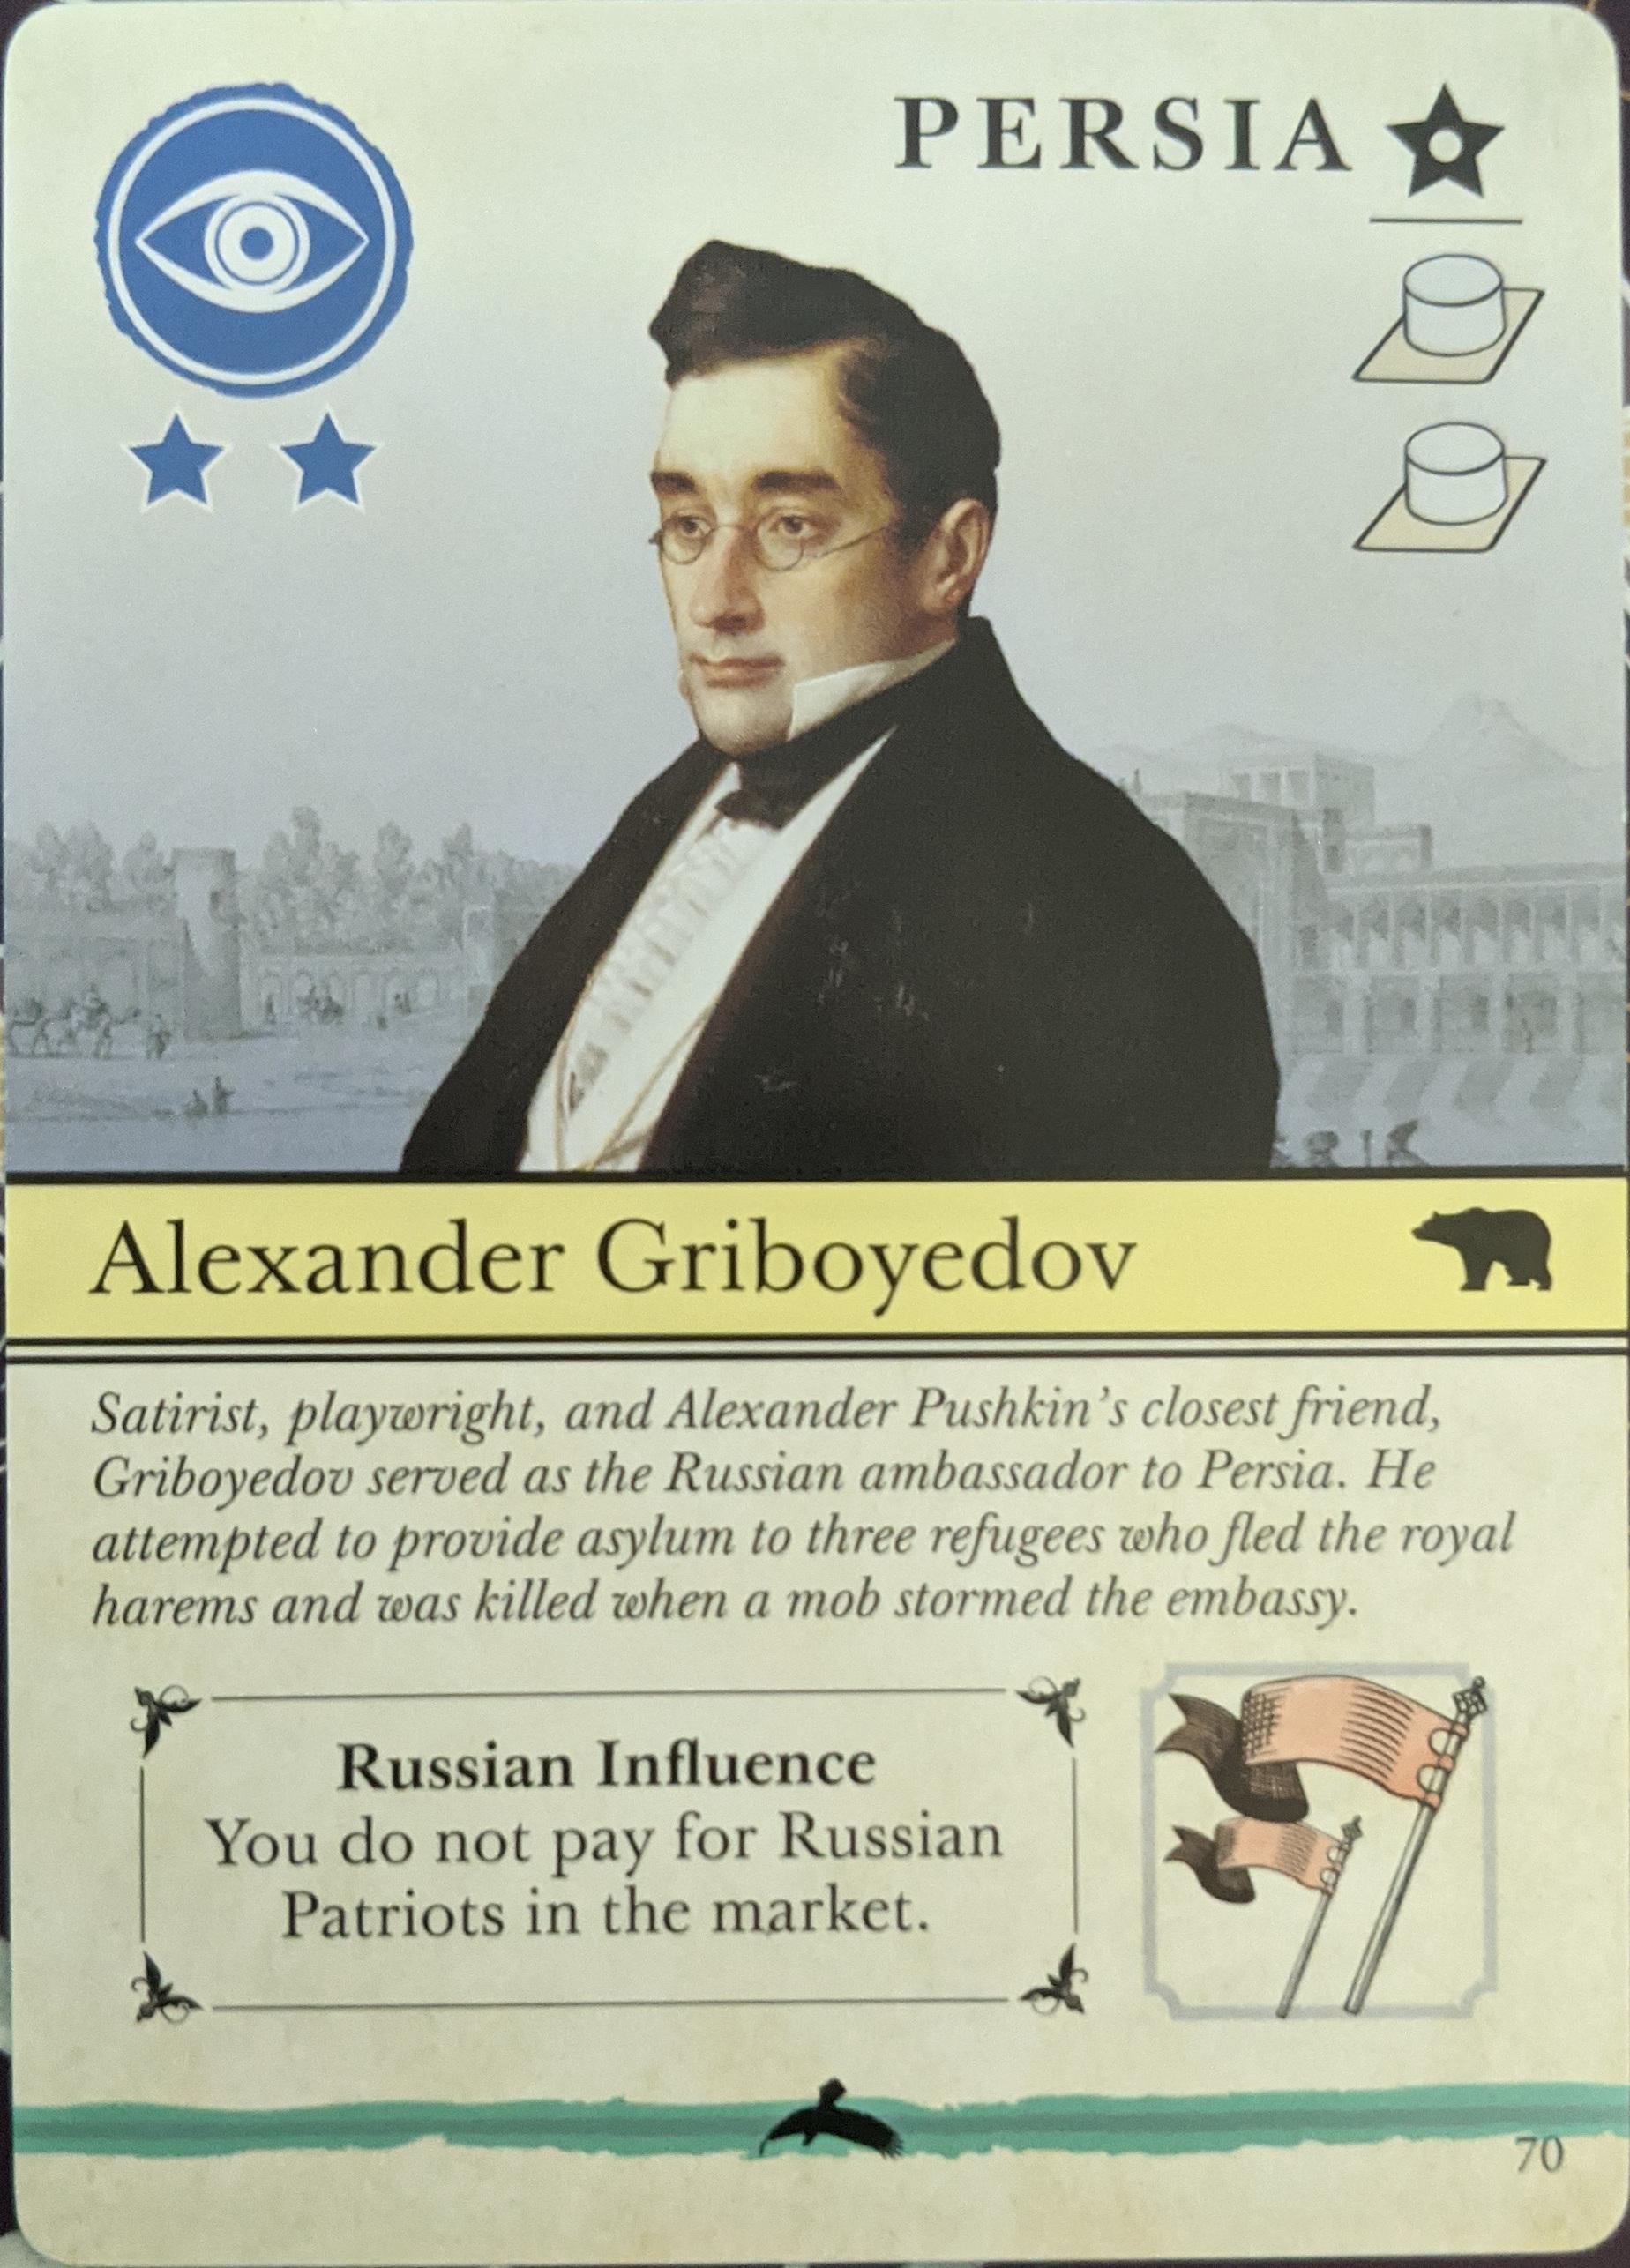 الکساندر گریبایدوف